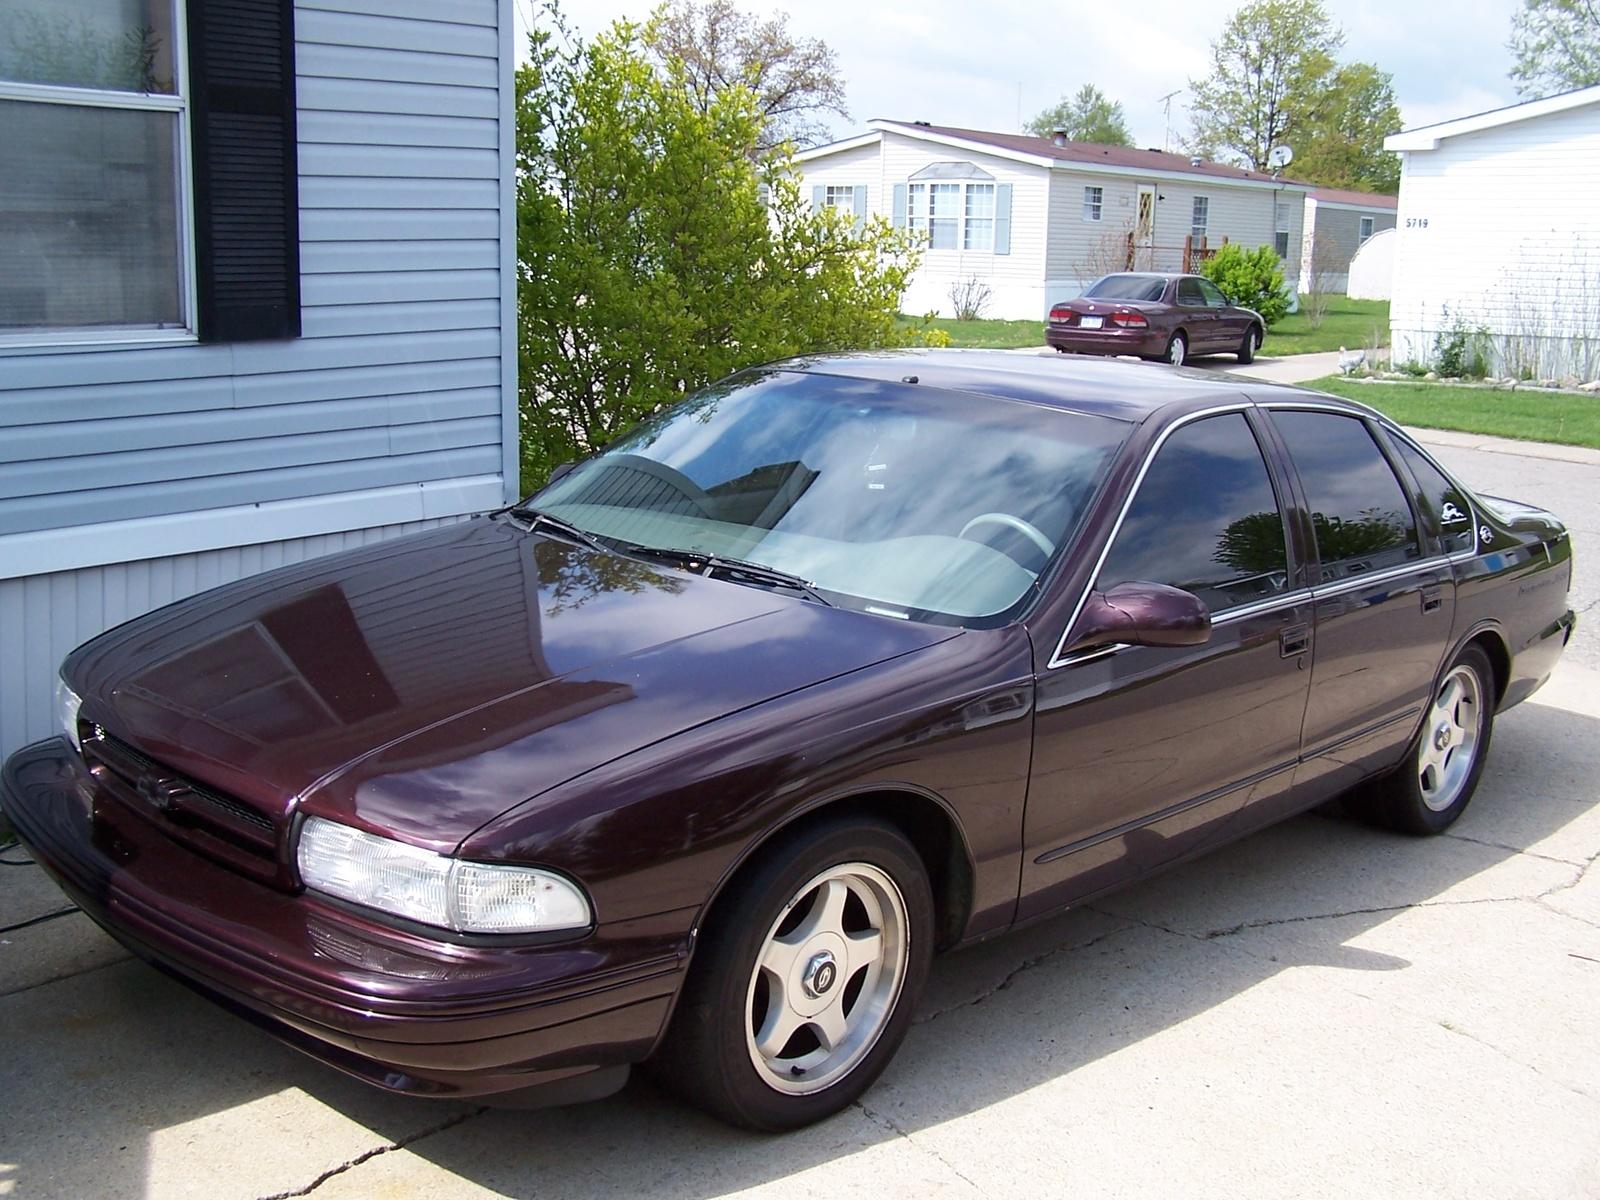 2000 chevrolet impala owners manual pdf